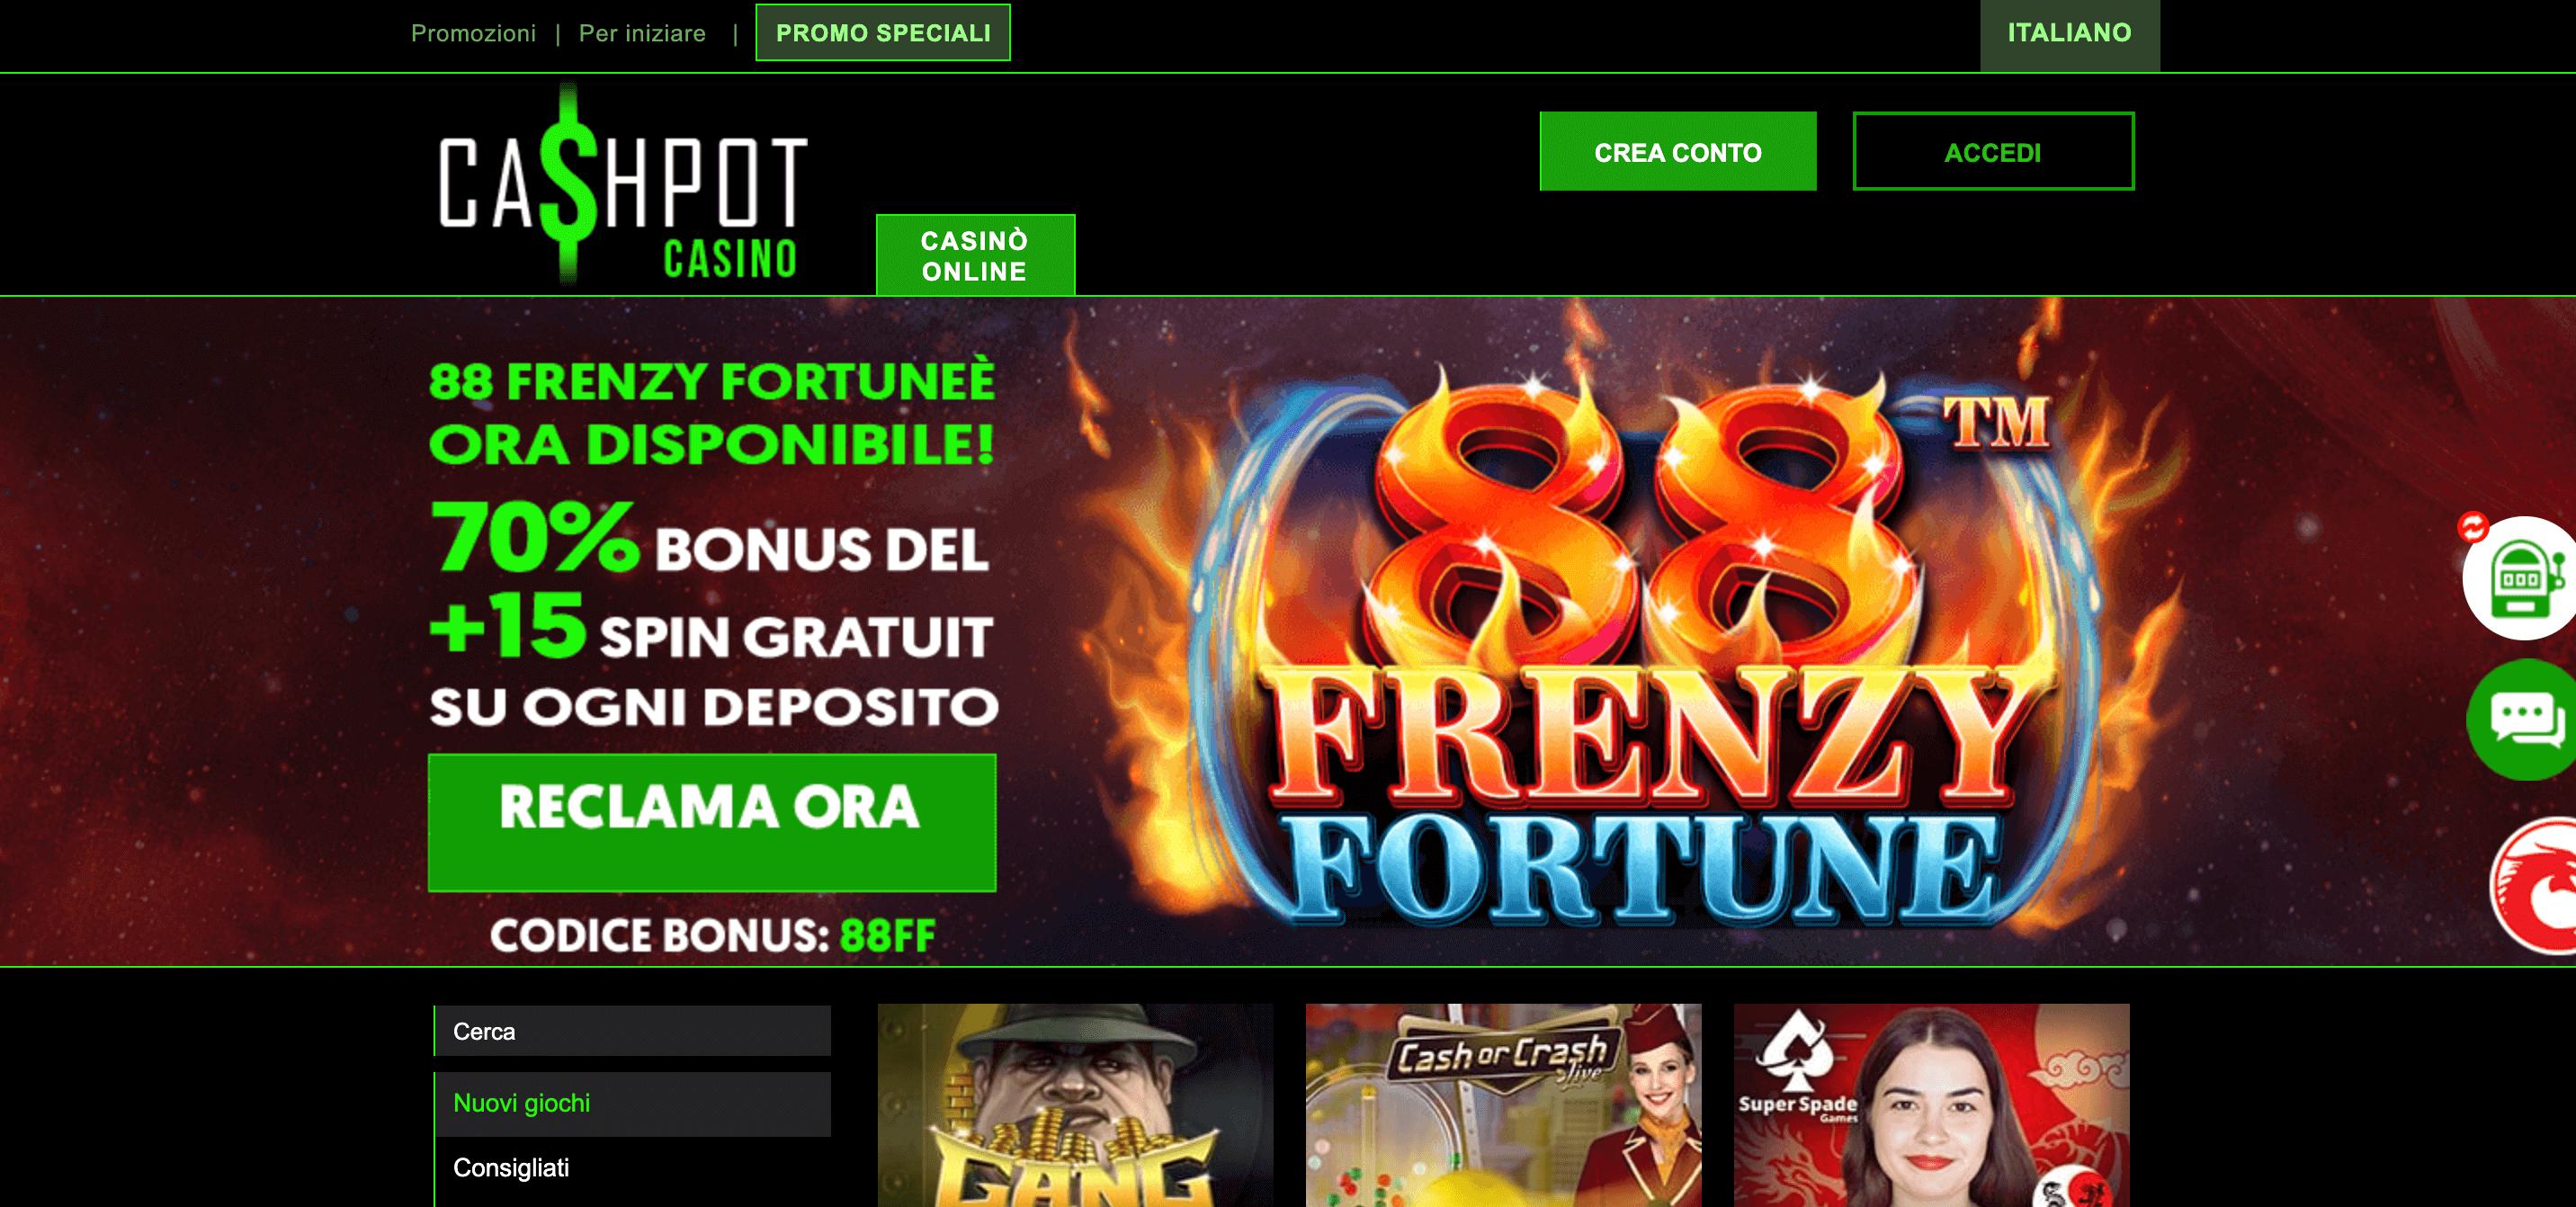 Cashpot Casino Screenshot